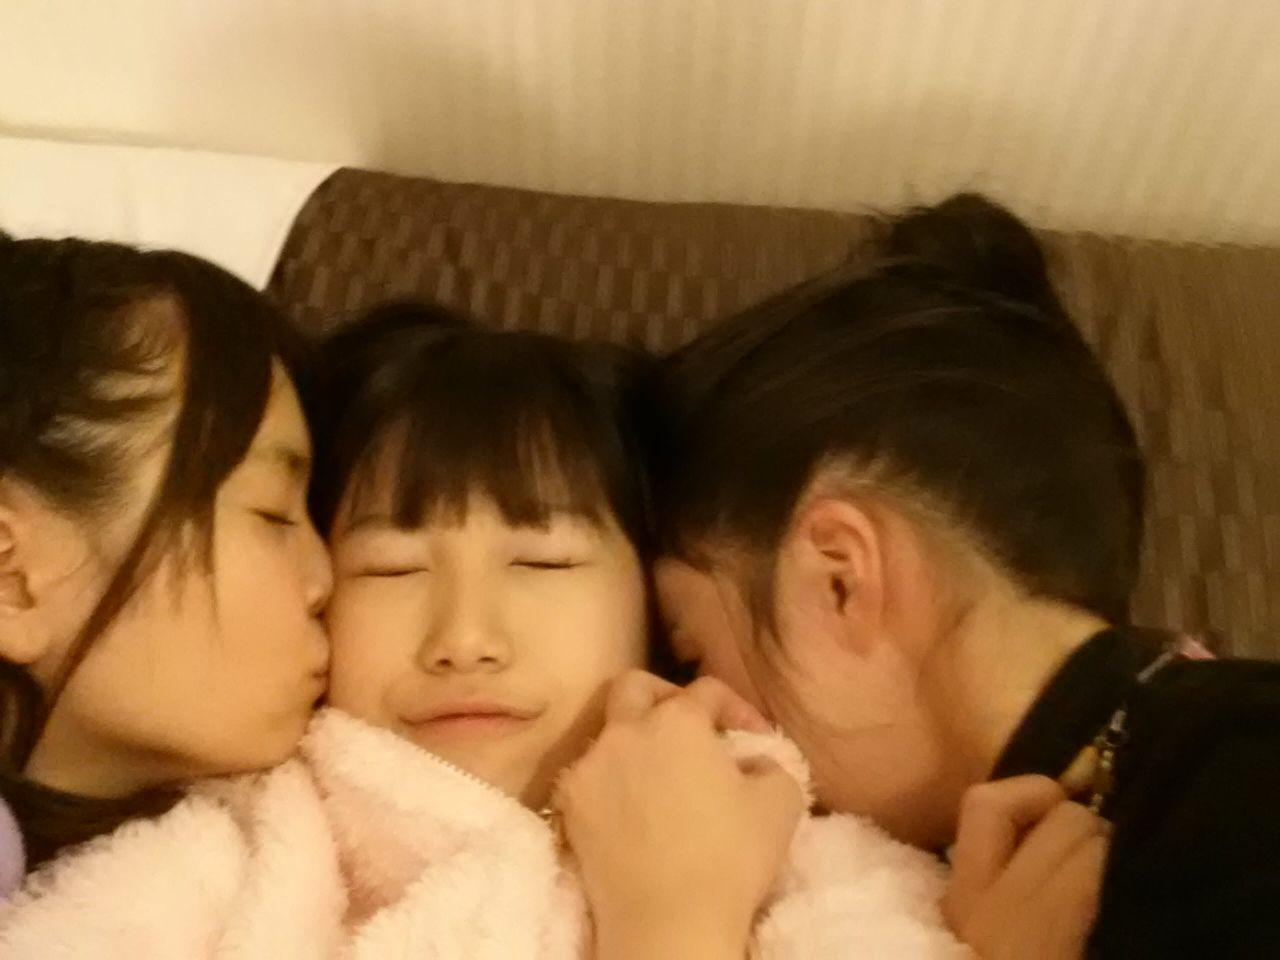 http://livedoor.blogimg.jp/otohaeika/imgs/7/f/7fc0d481.jpg